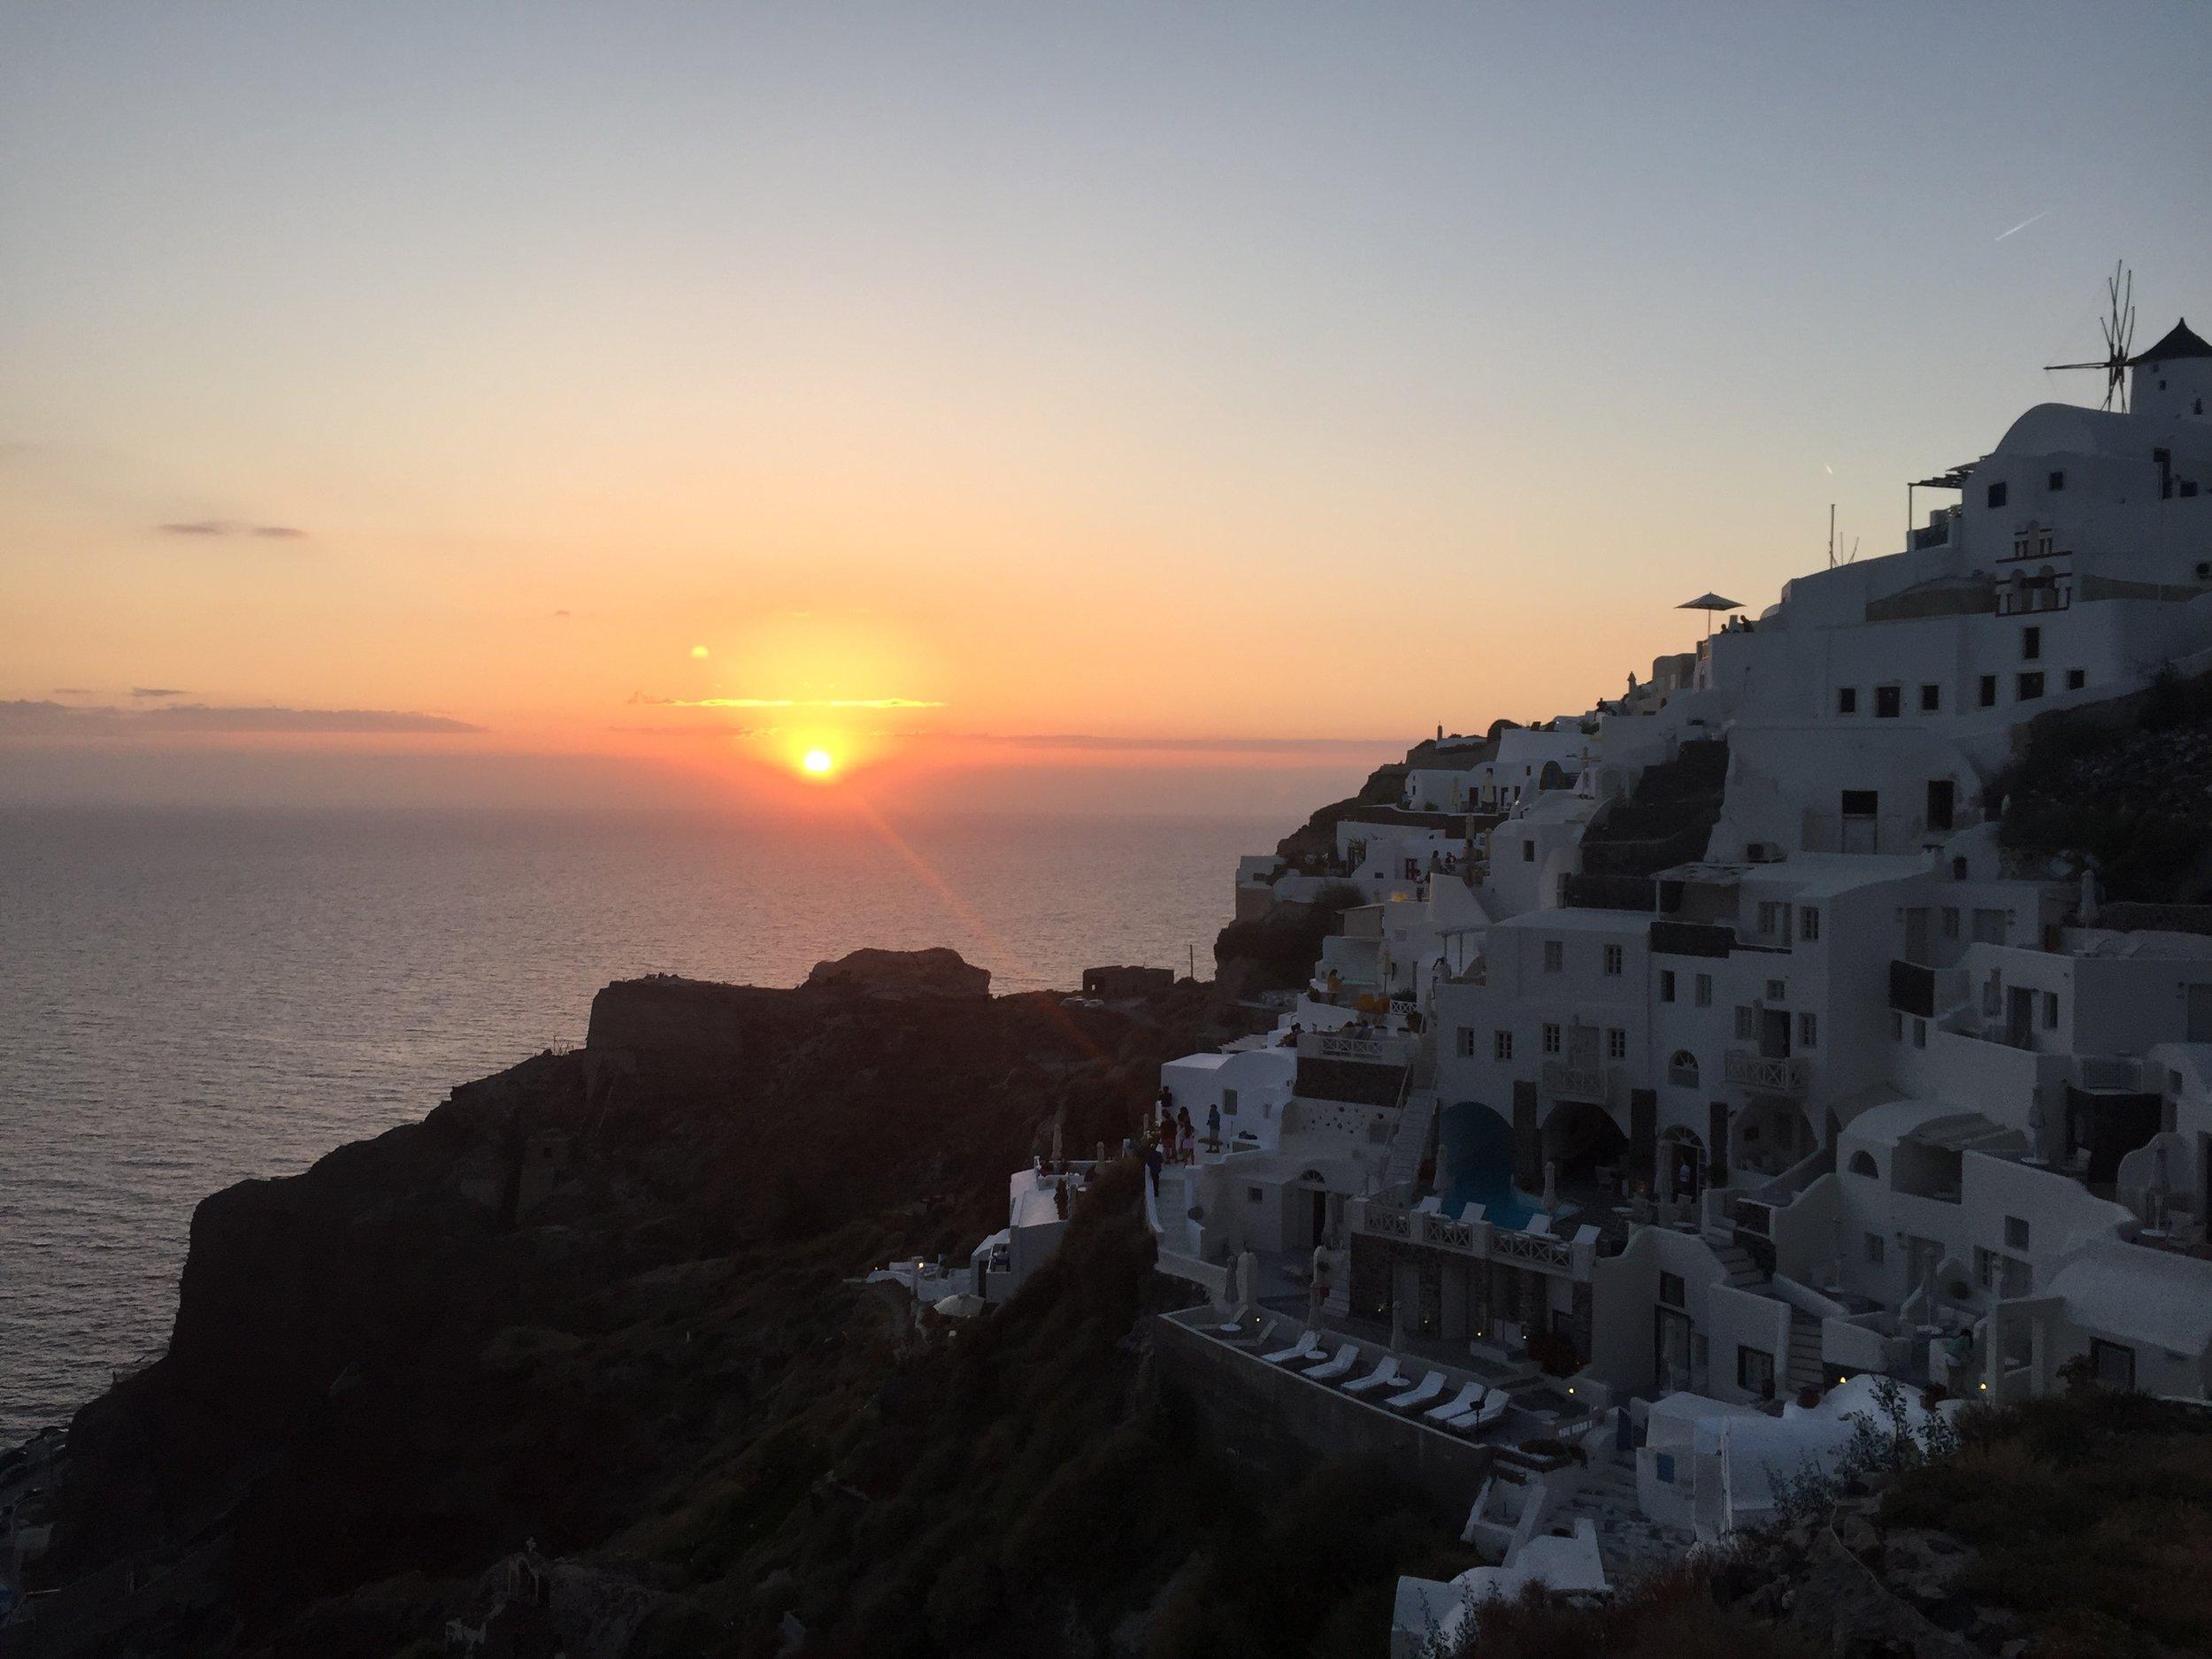 santorini, greece   I   @ofthesamemix